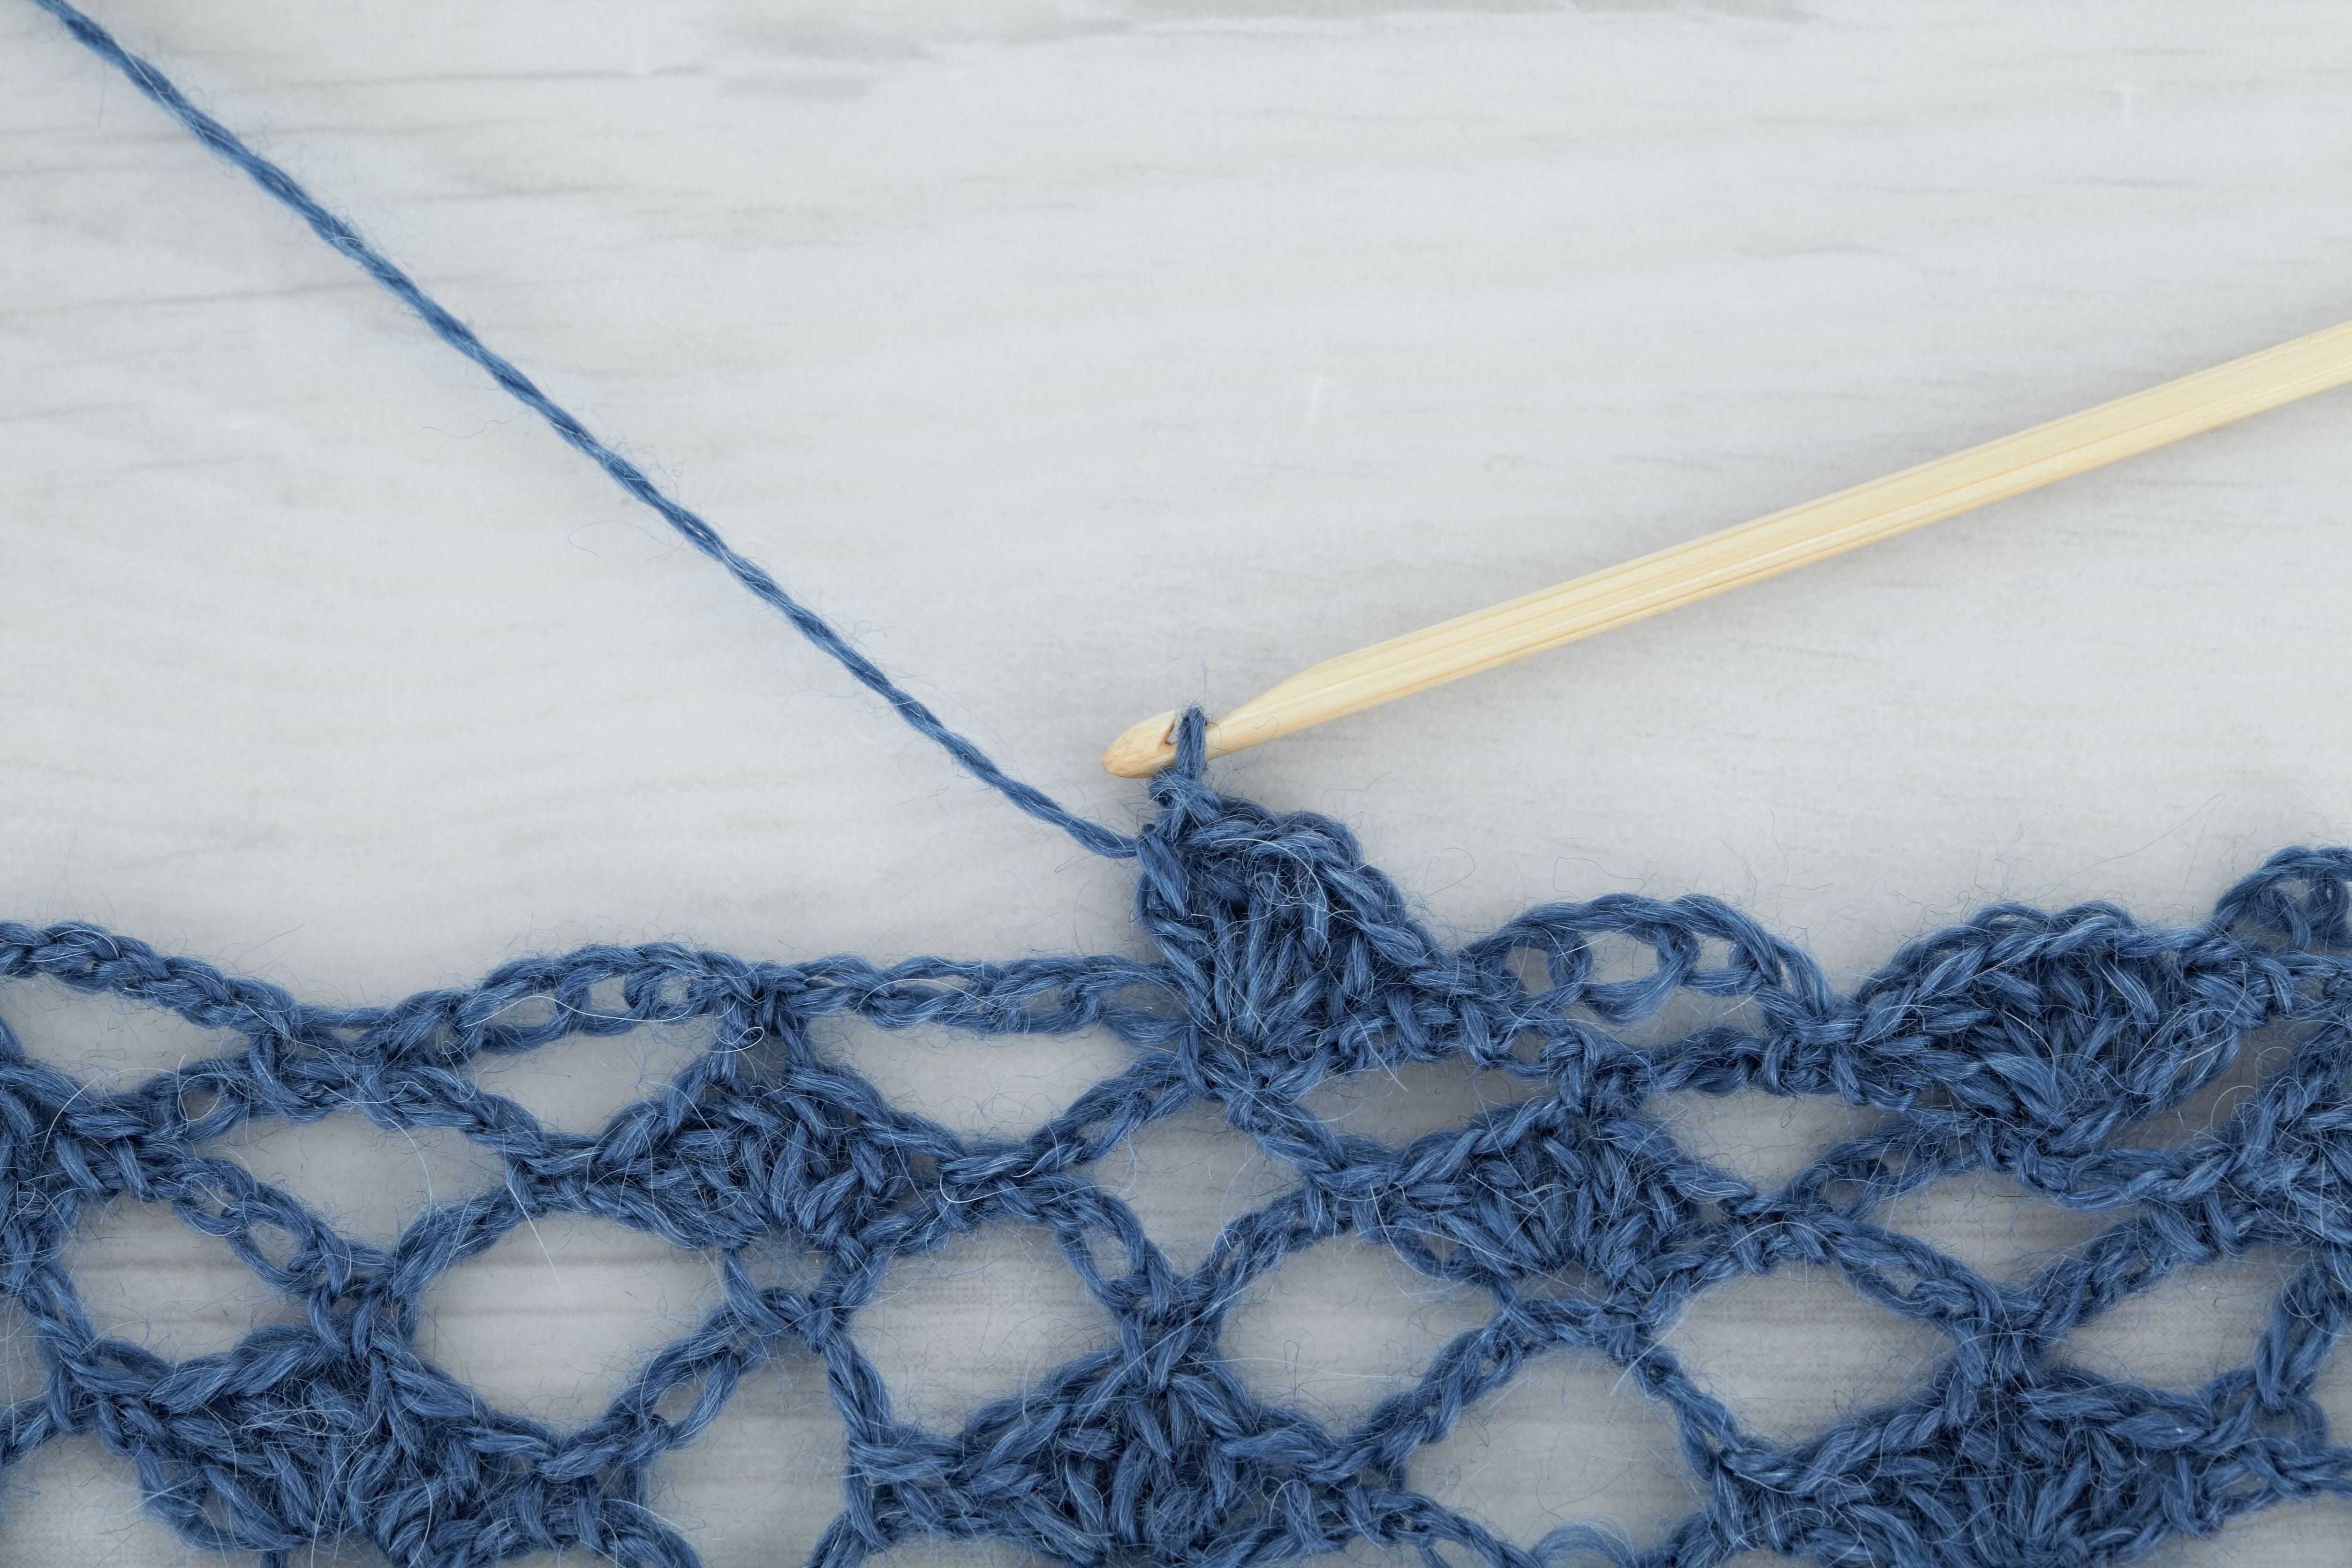 Crochet hook with blue wool making openwork scarf